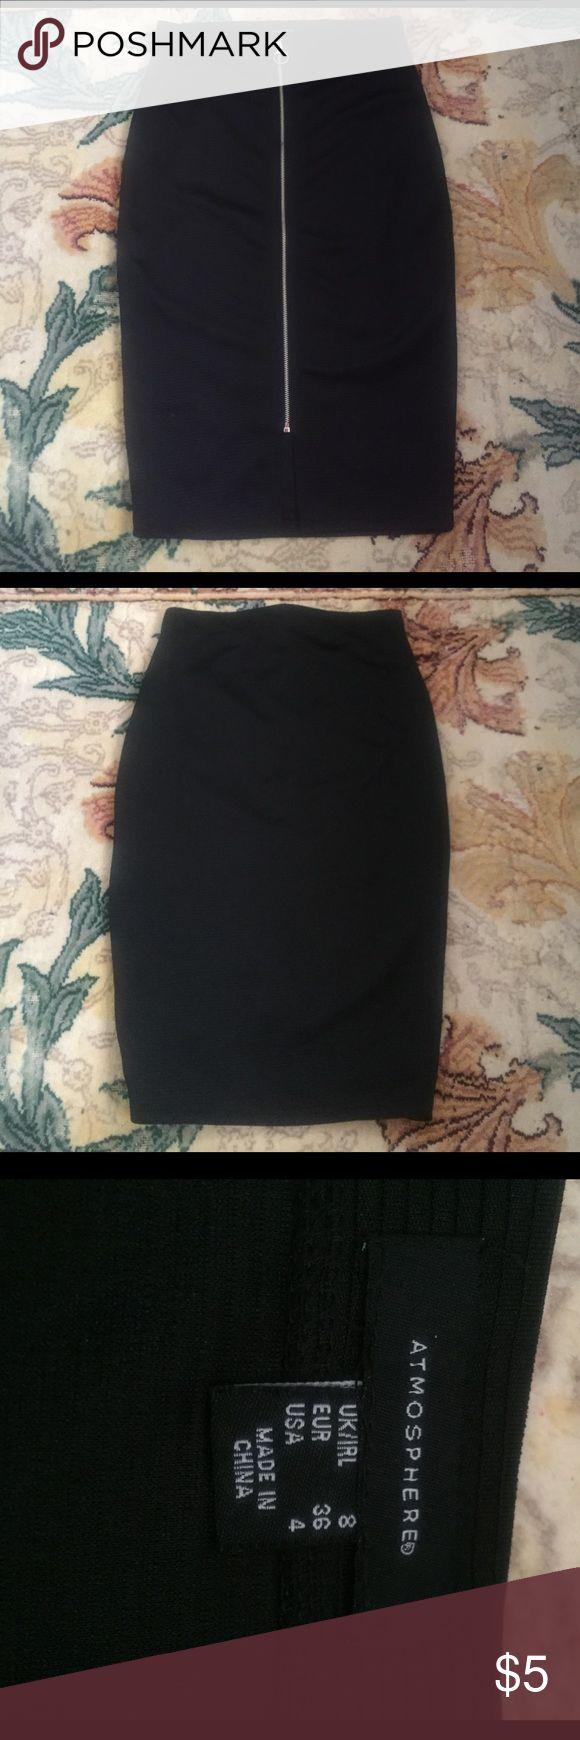 Black Pencil Skirt Black pencil skirt with silver zipper Primark Skirts Pencil